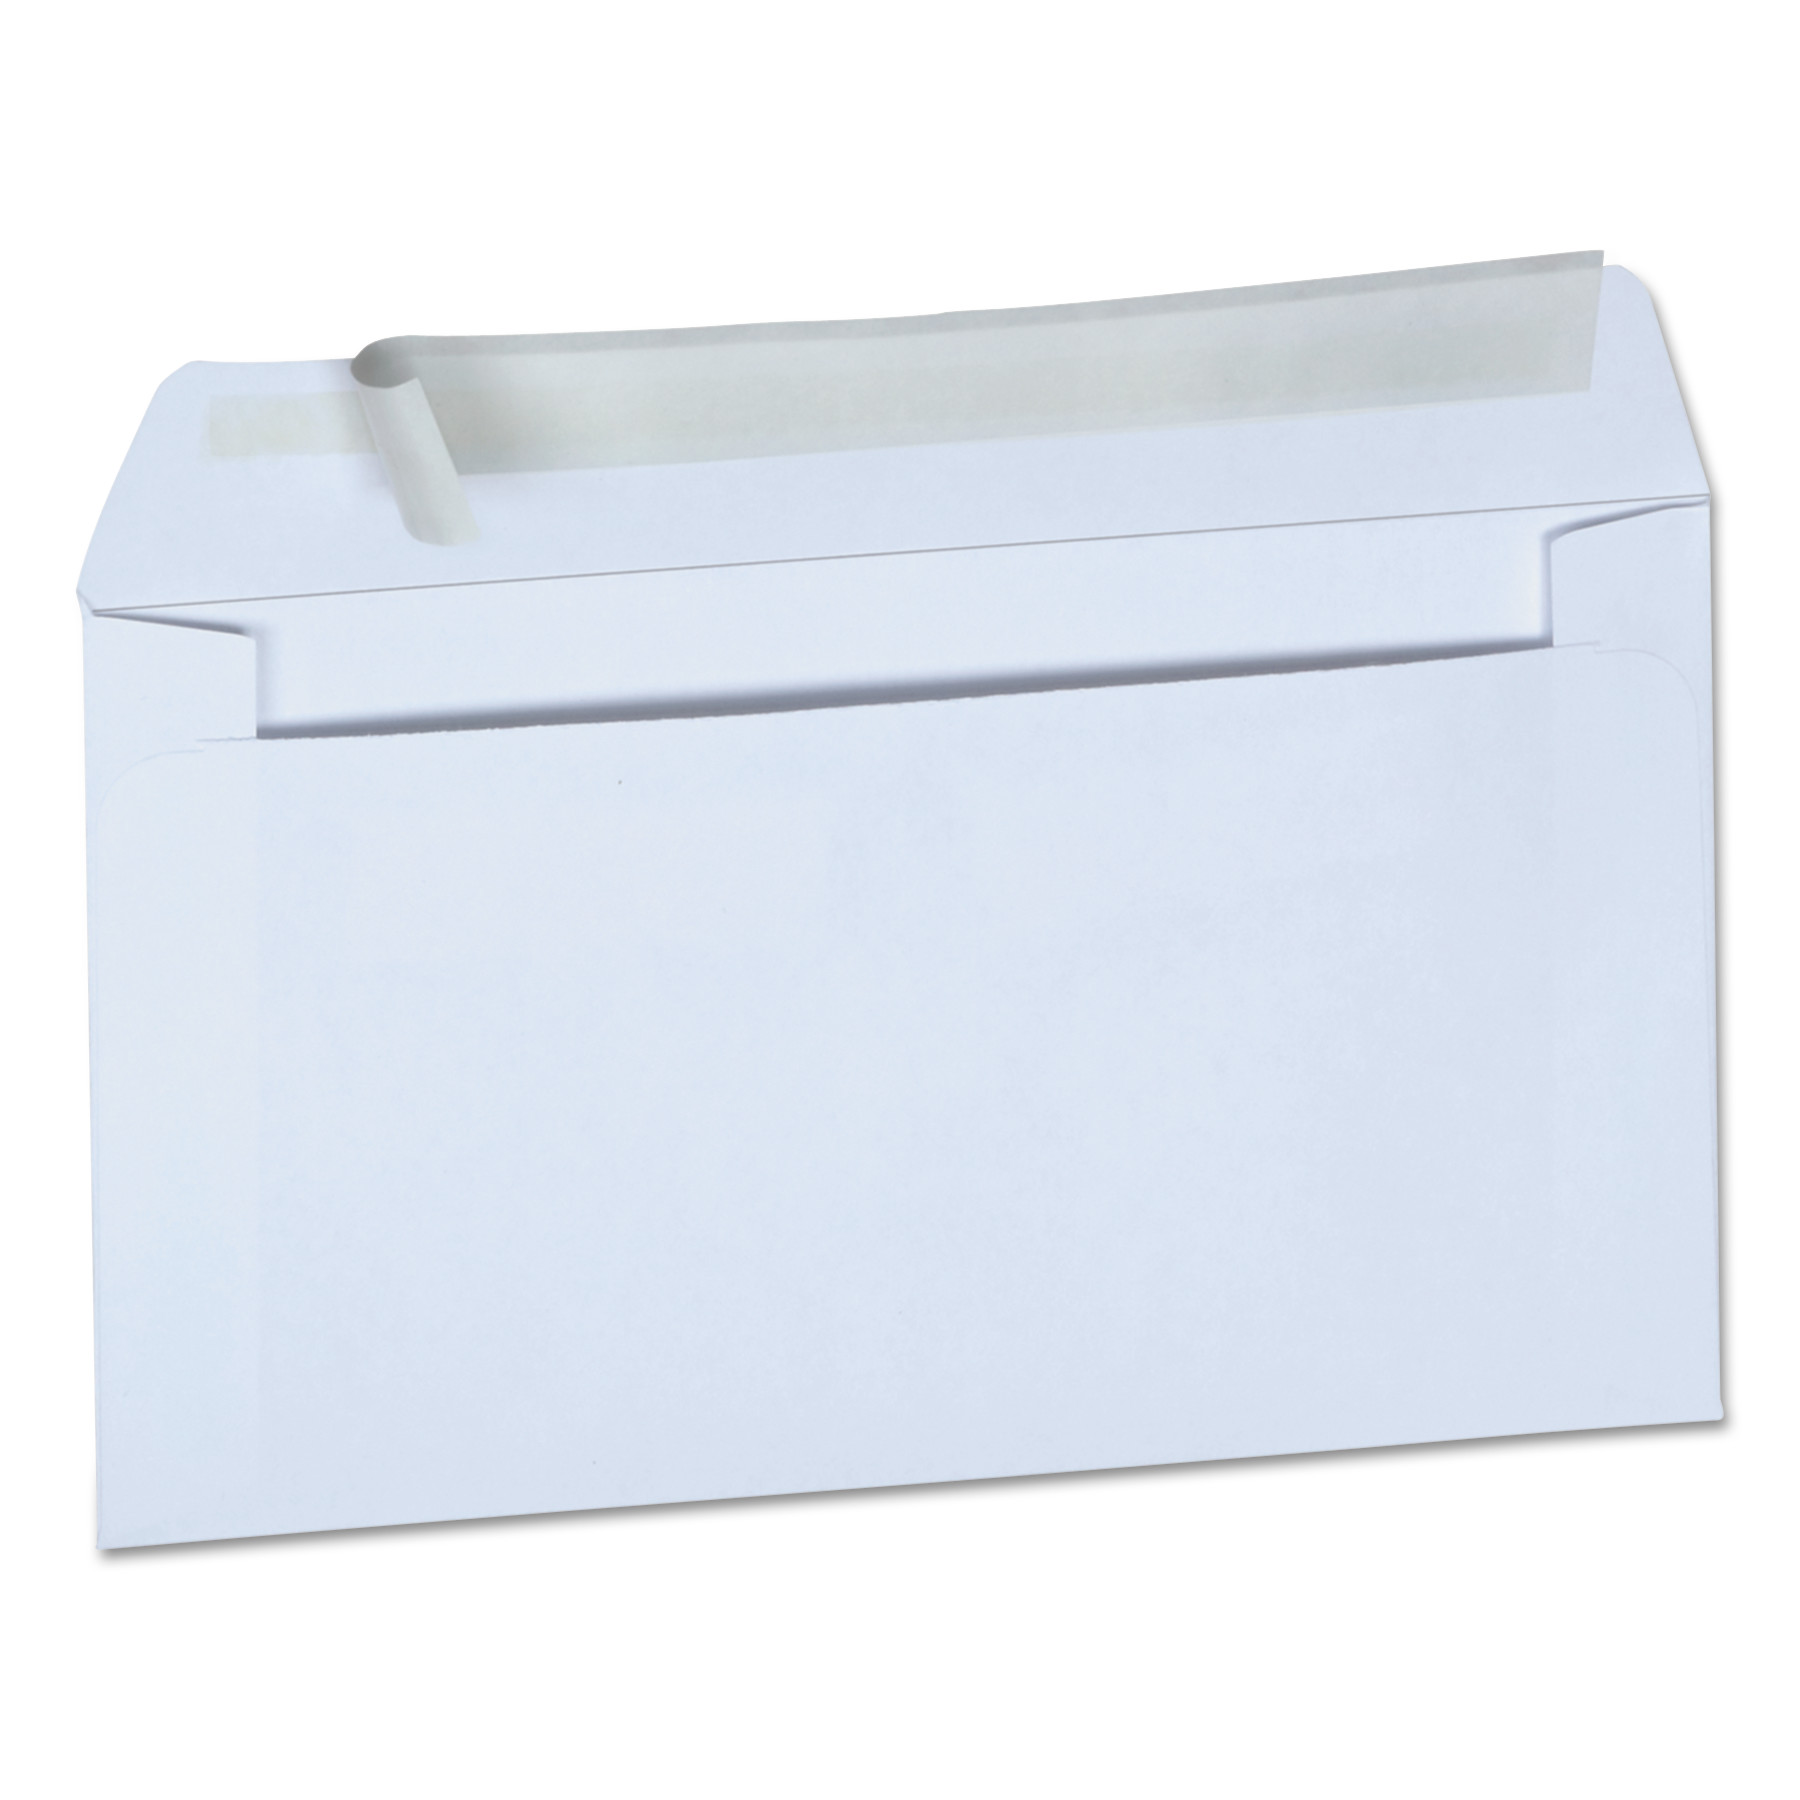 Peel Seal Strip Business Envelope, #6 3/4, Square Flap, Self-Adhesive Closure, 3.63 x 6.5, White, 100/Box